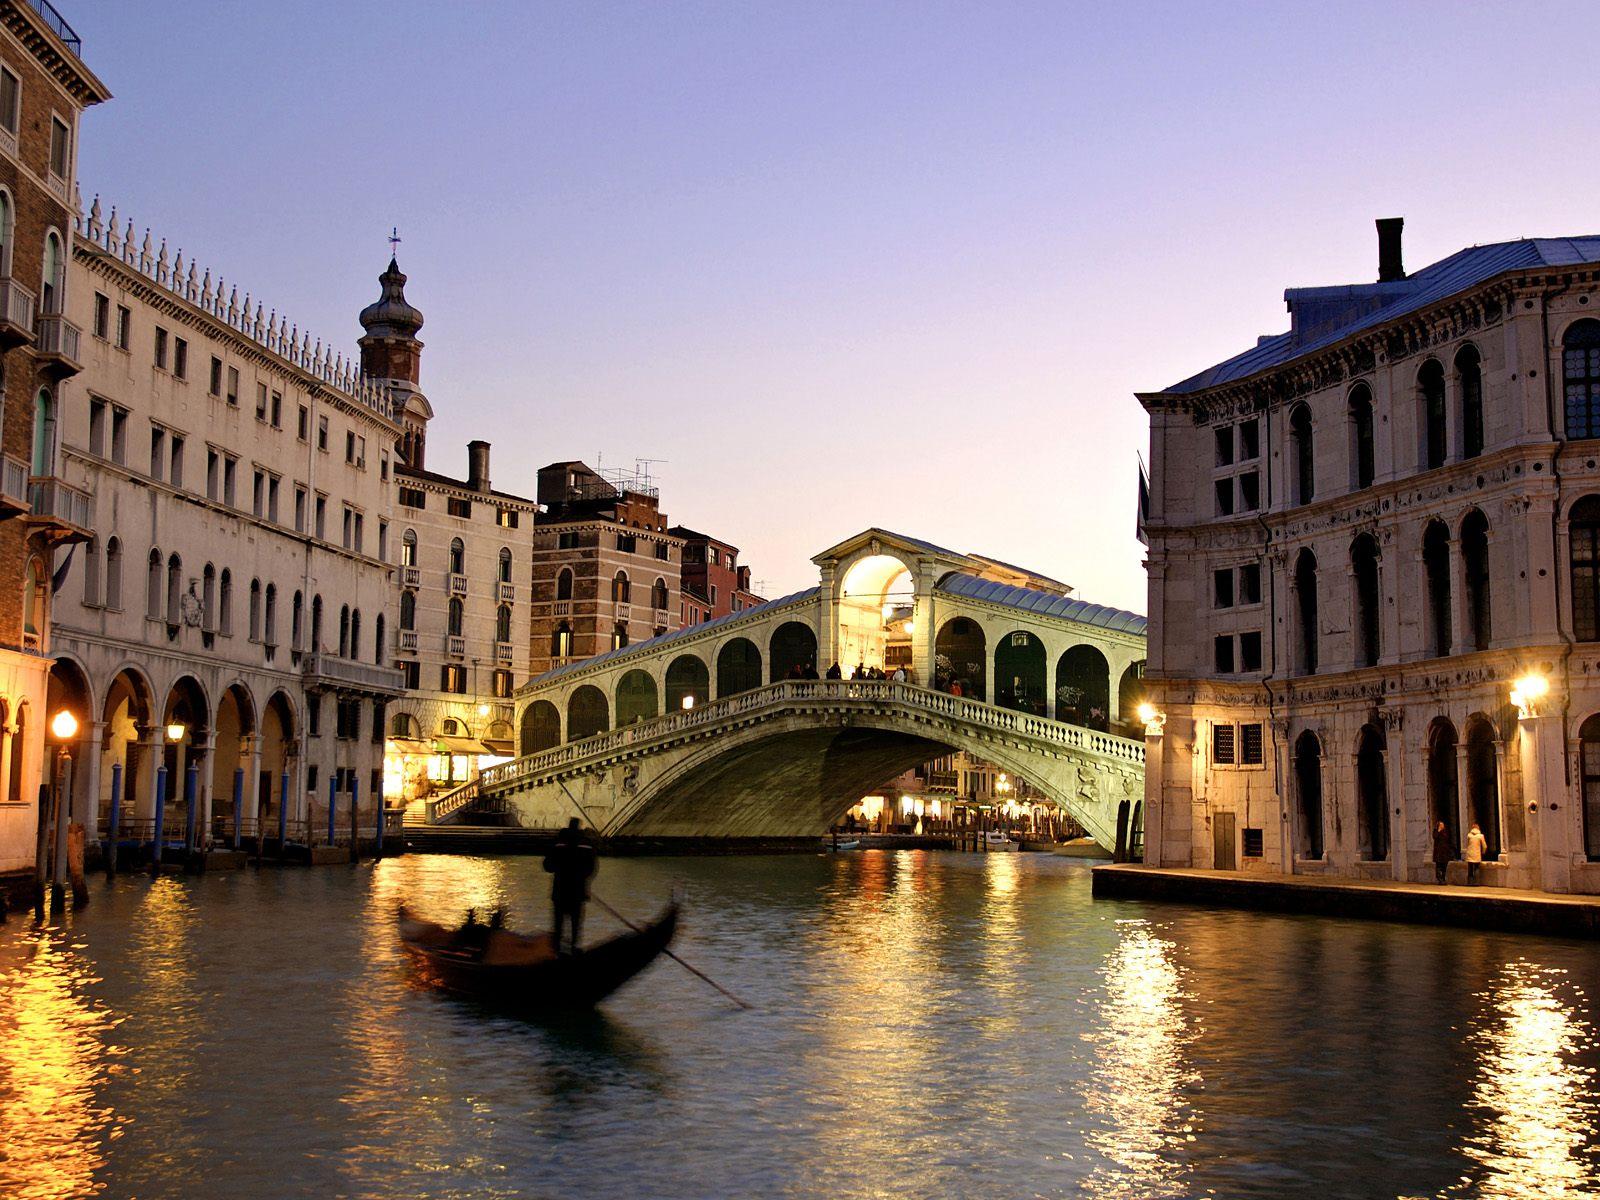 http://4.bp.blogspot.com/_E7ik4q_NXFA/TUP2Hv0ZakI/AAAAAAAABq0/1UNMmAOVFn4/s1600/rialto-bridge-grand-canal-venice-italy.jpg